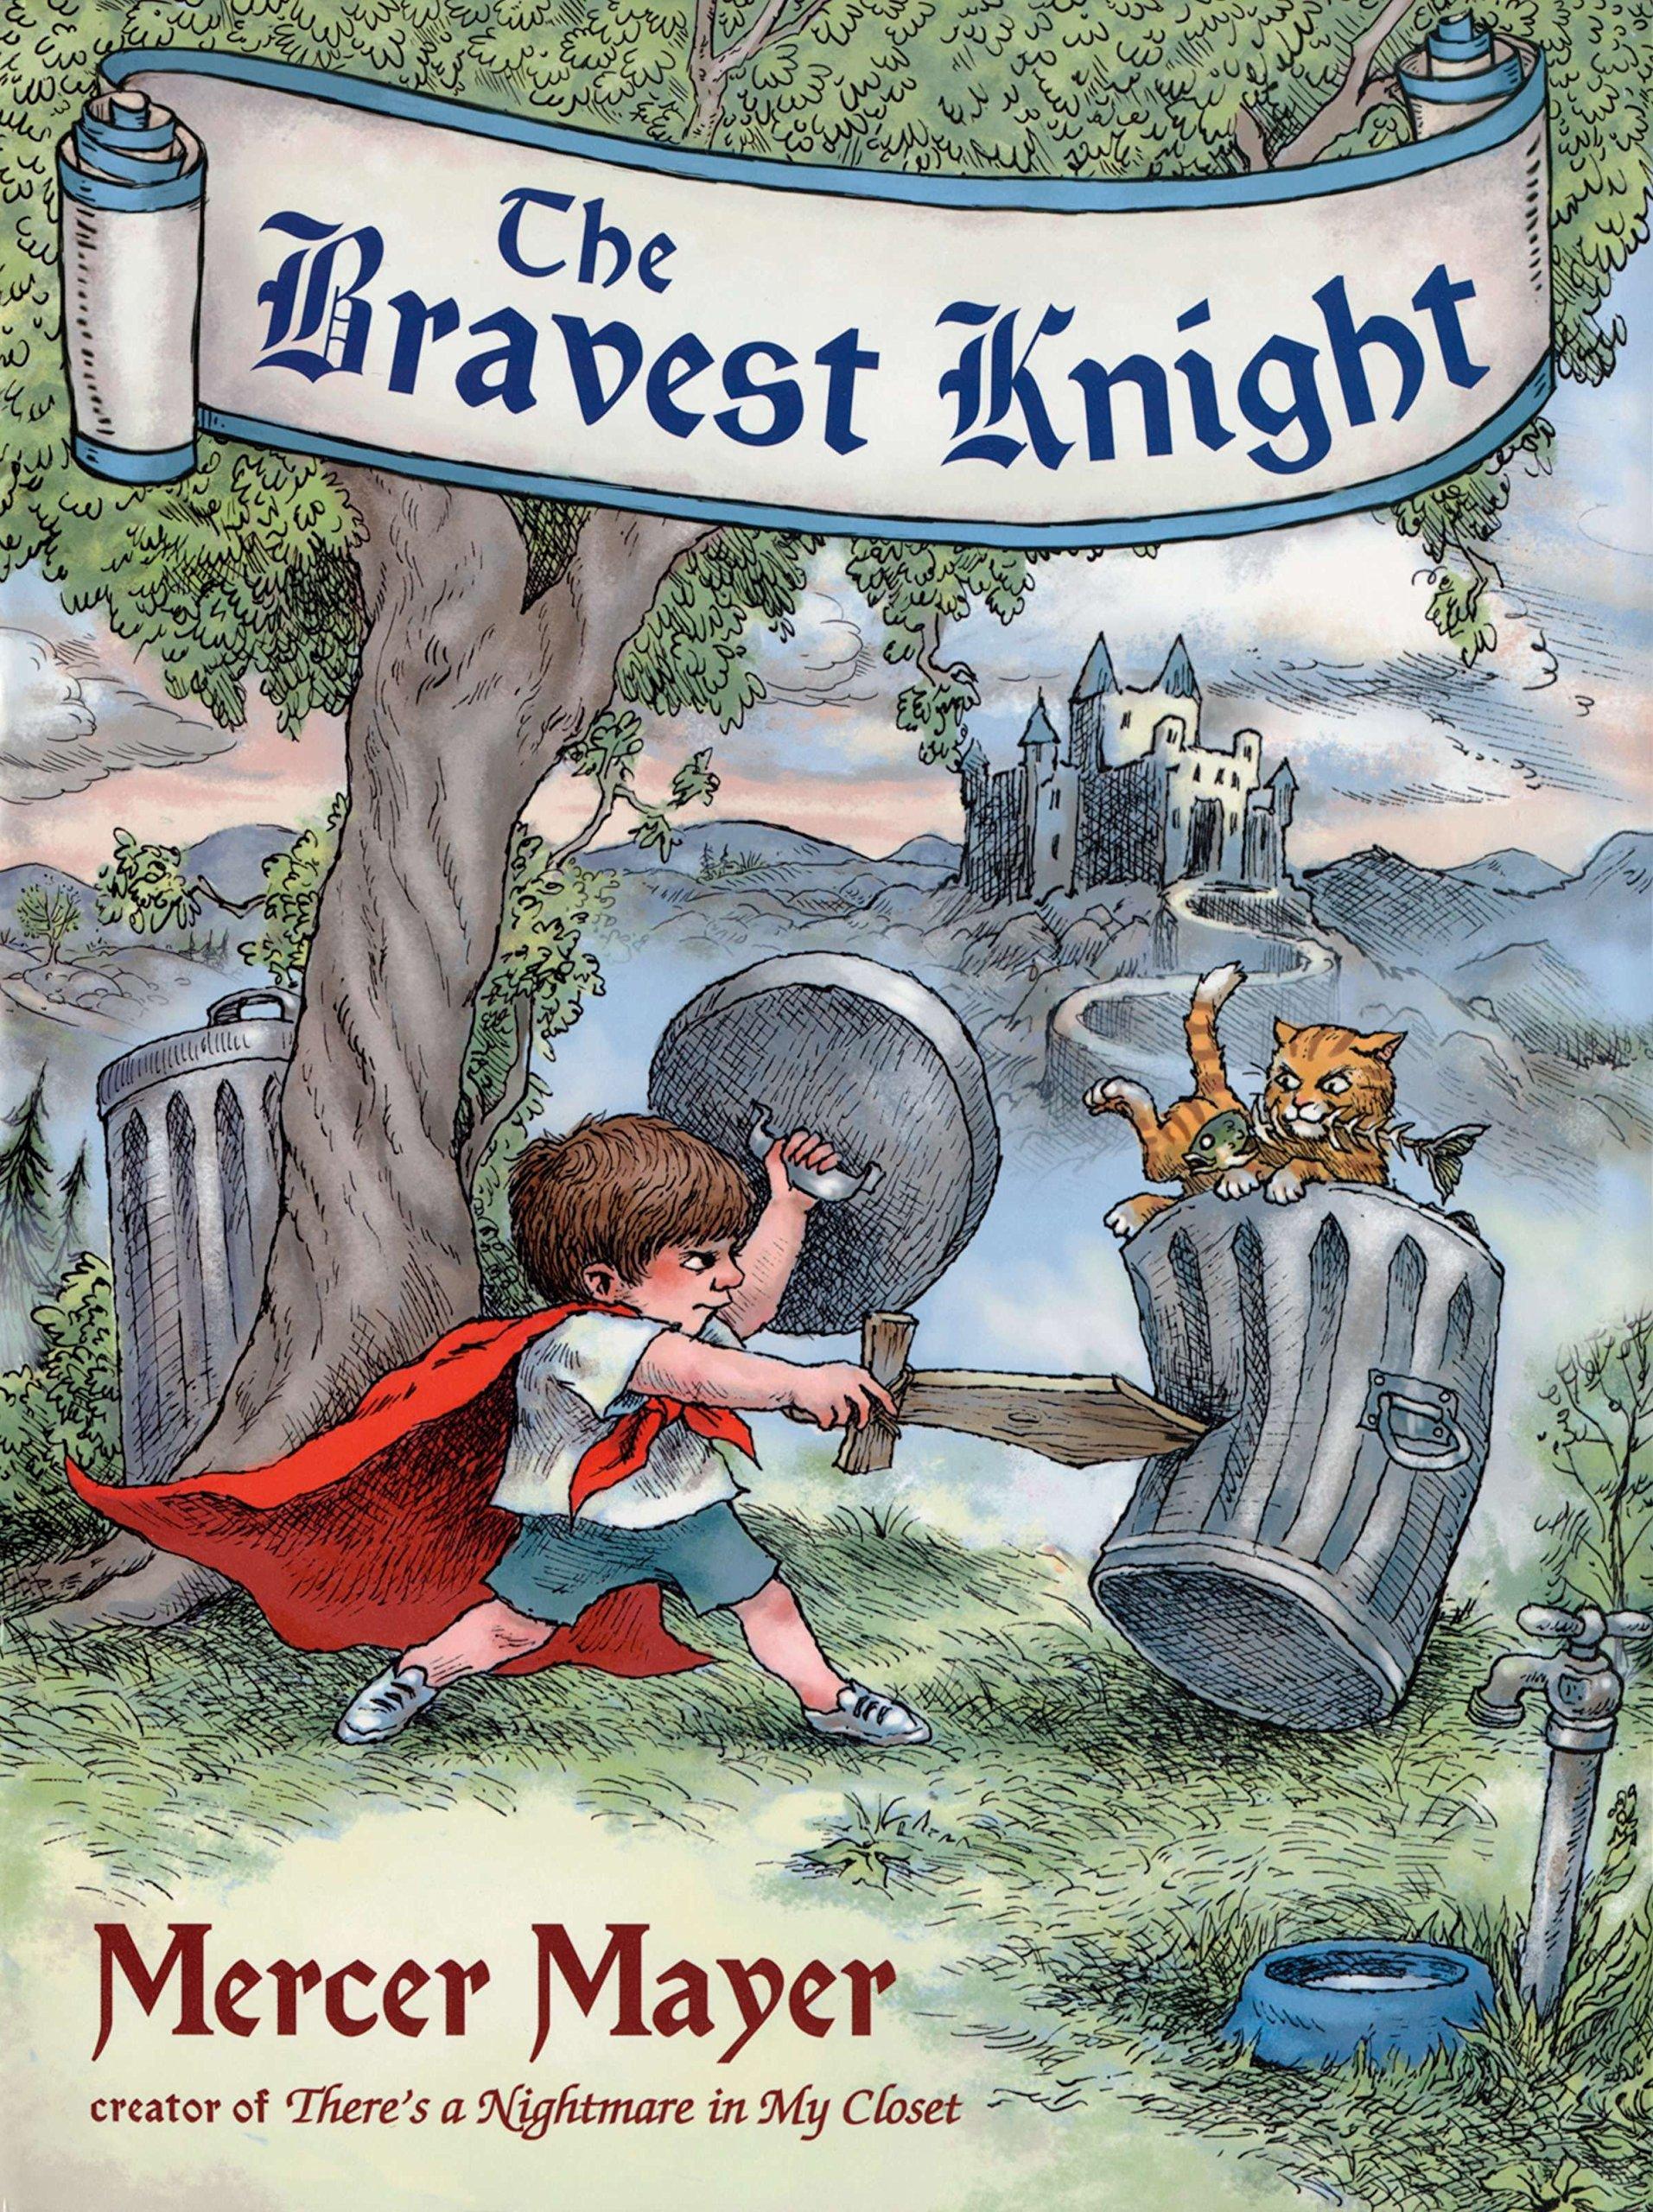 Bravest Knight Mercer Mayer